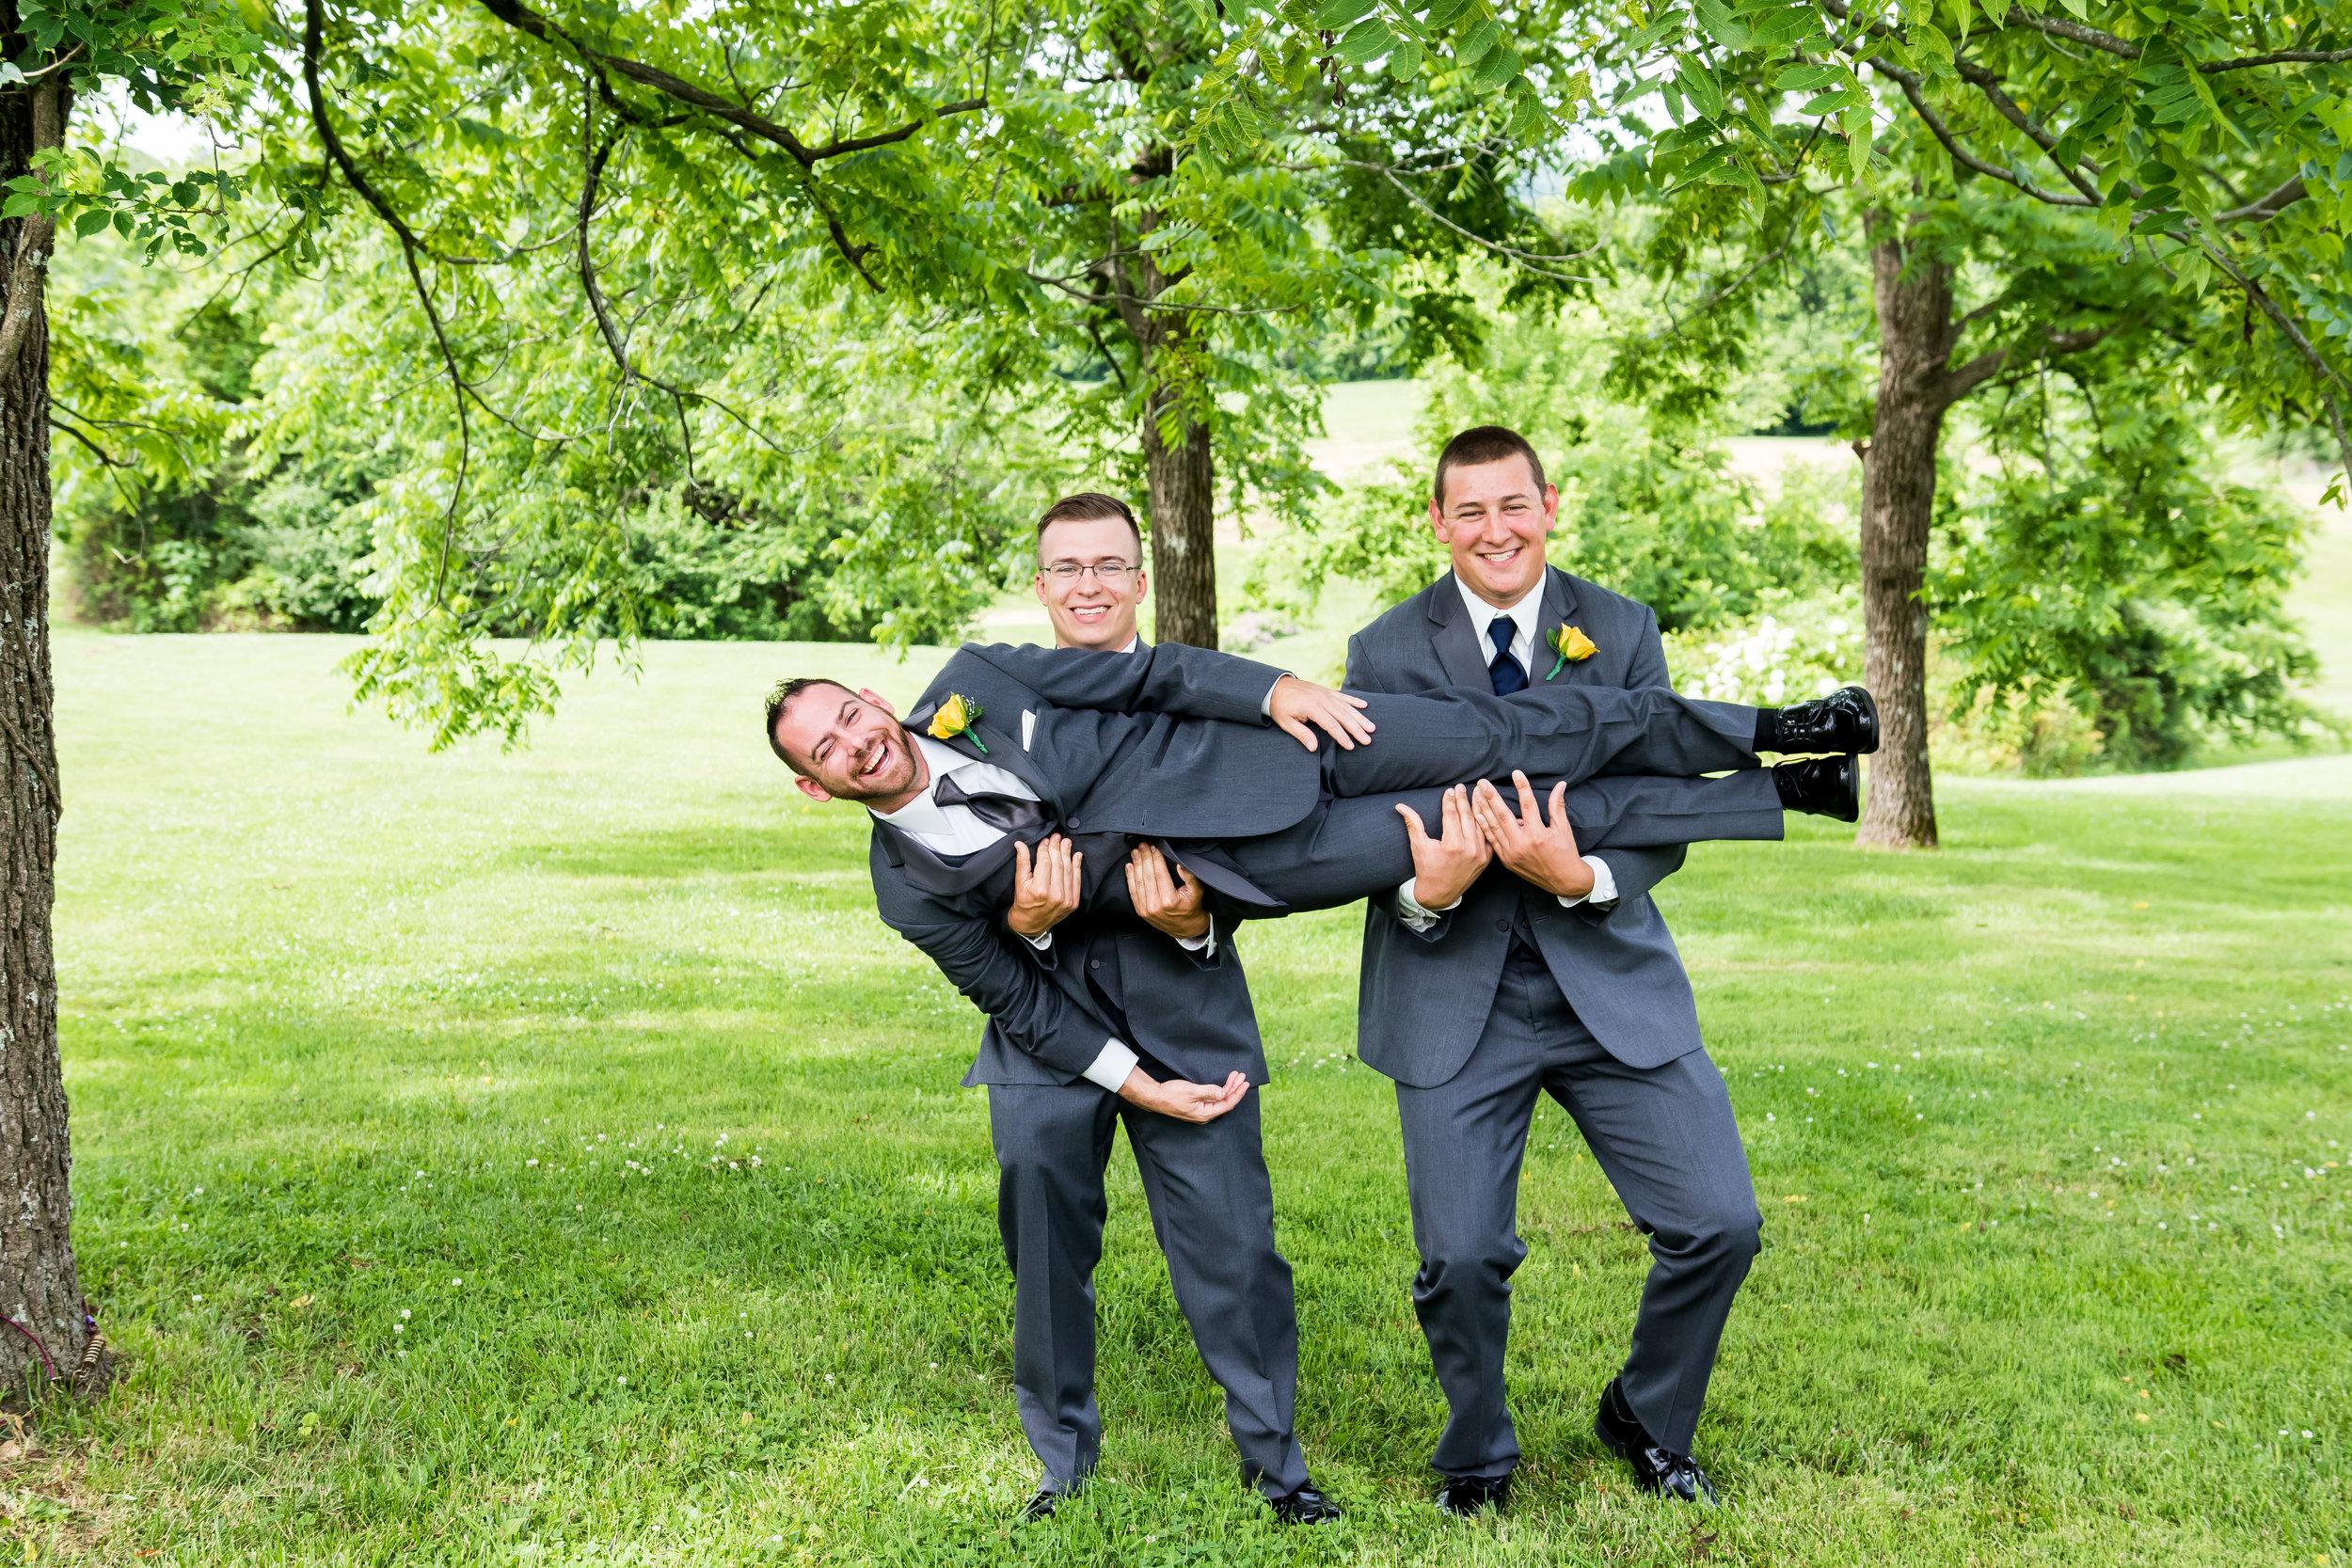 Wedding_Photography_Ward-161.jpg